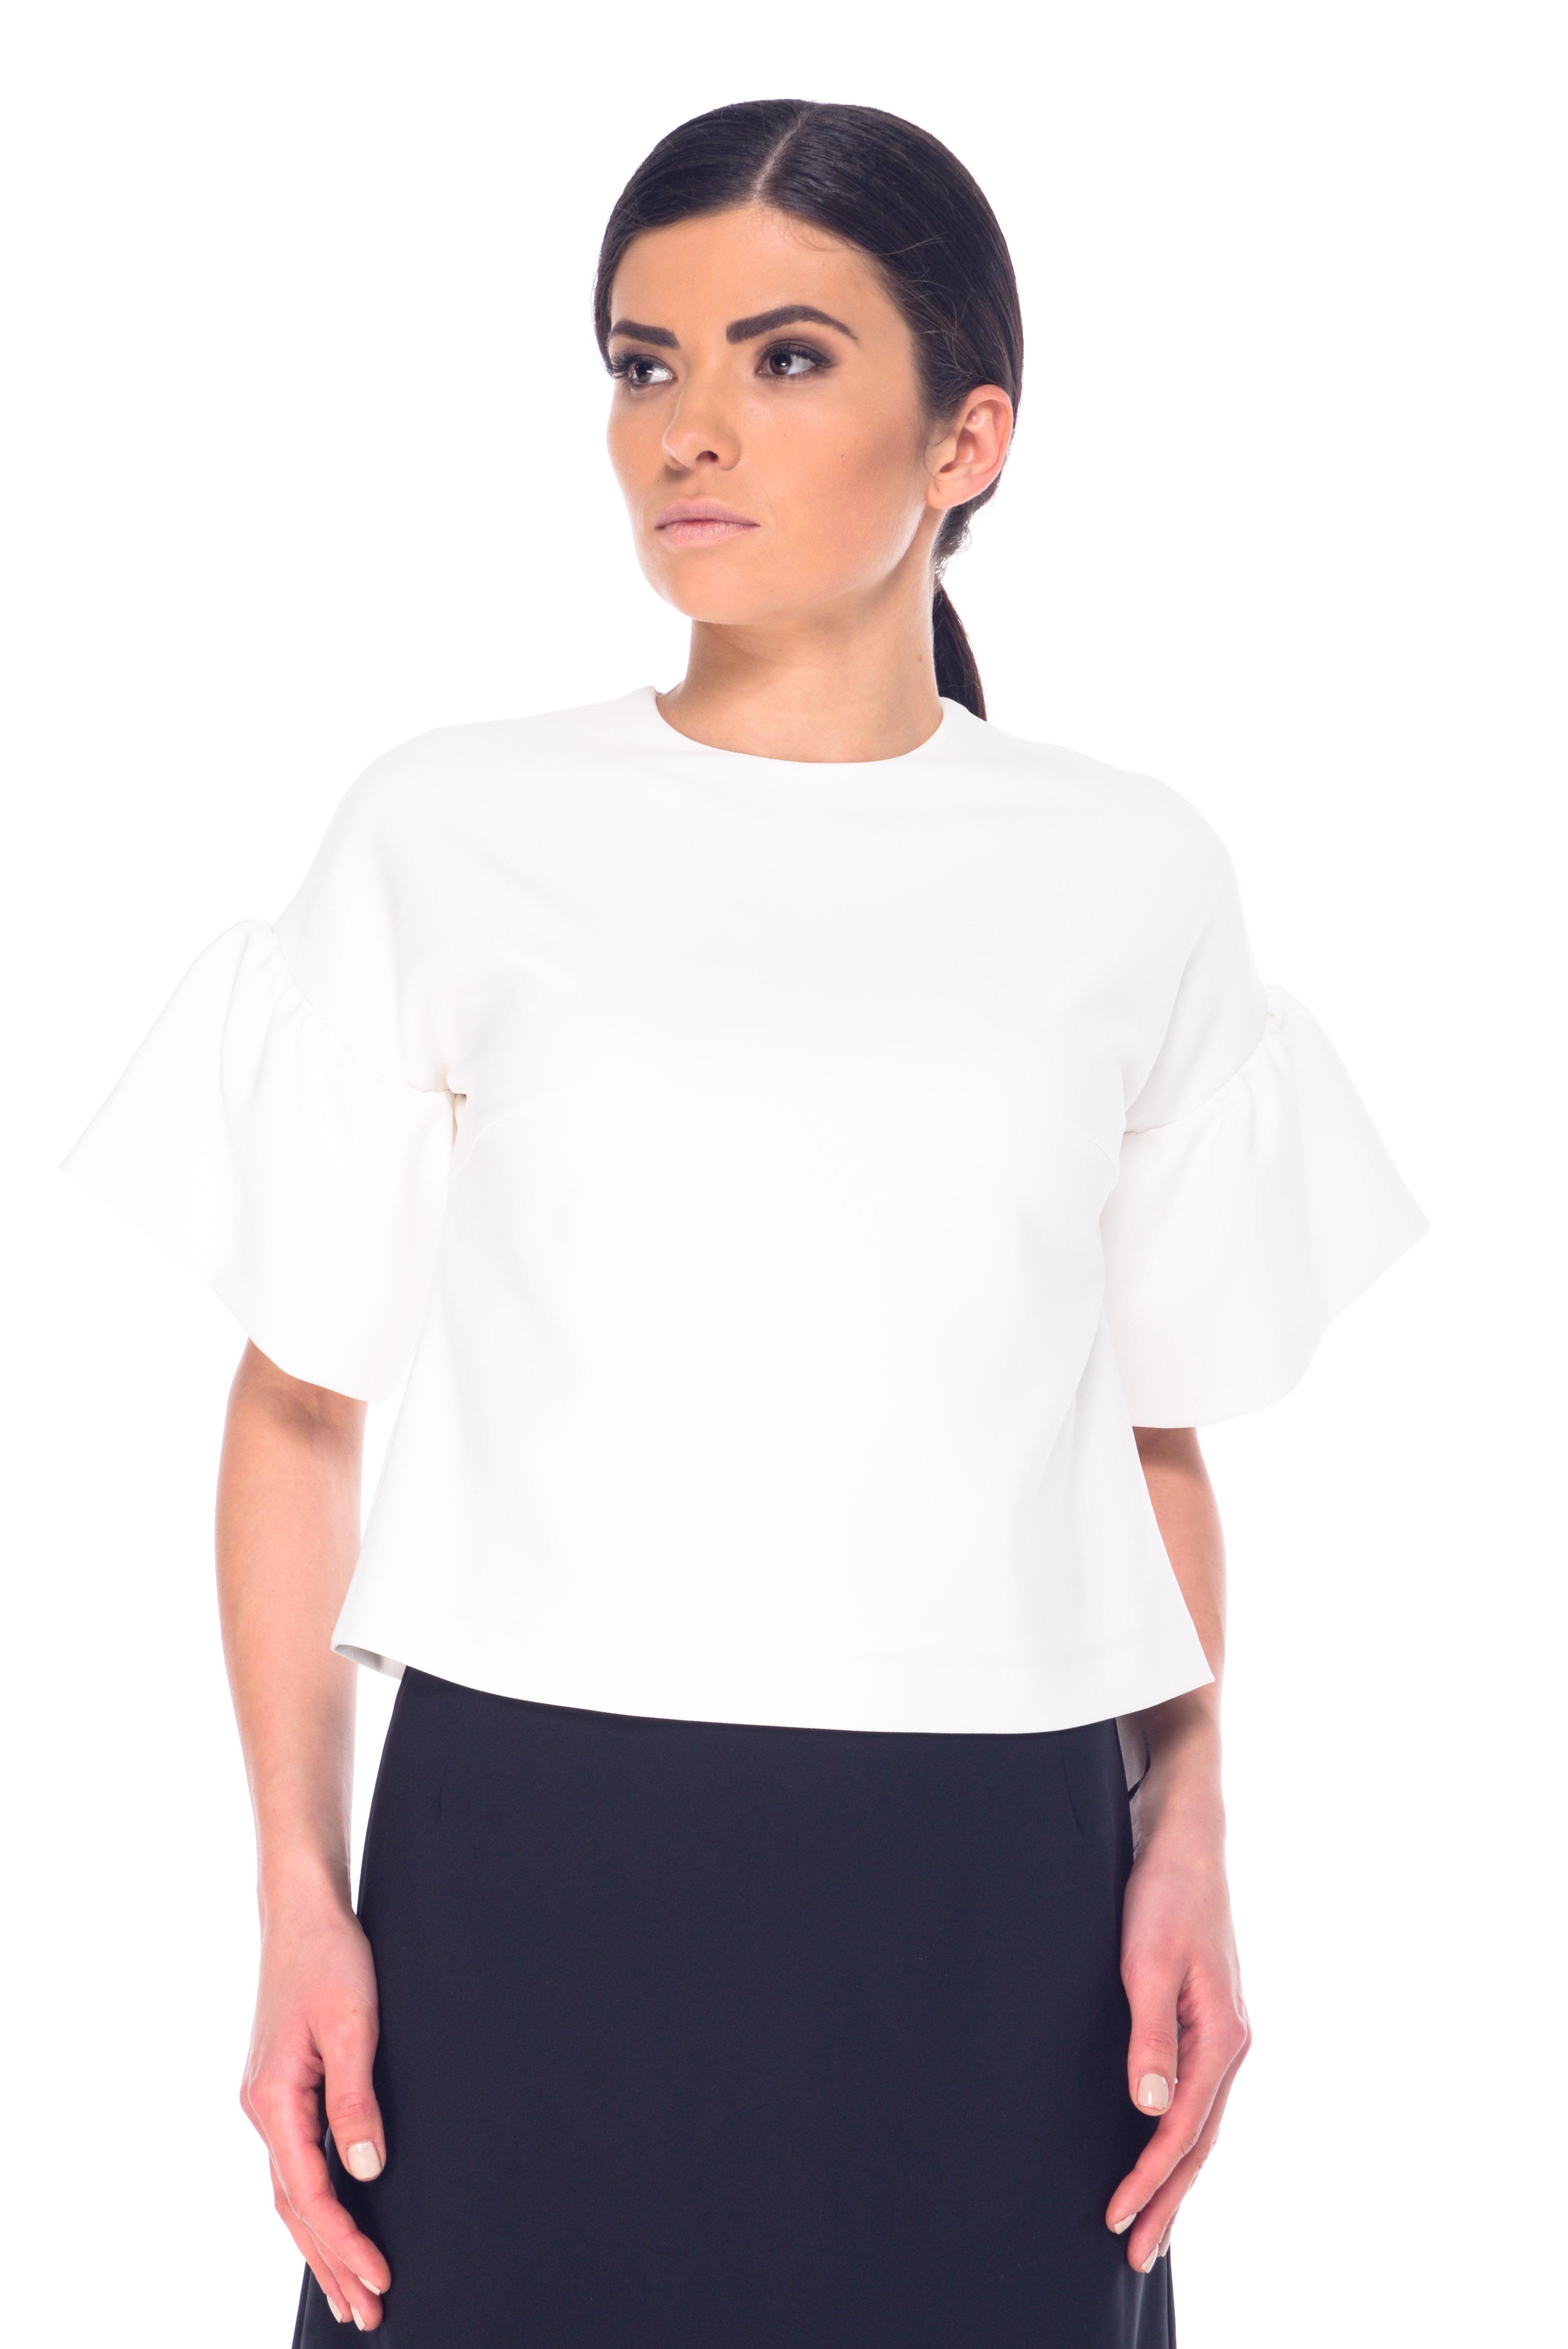 Блузка женская. L 7062L 7062